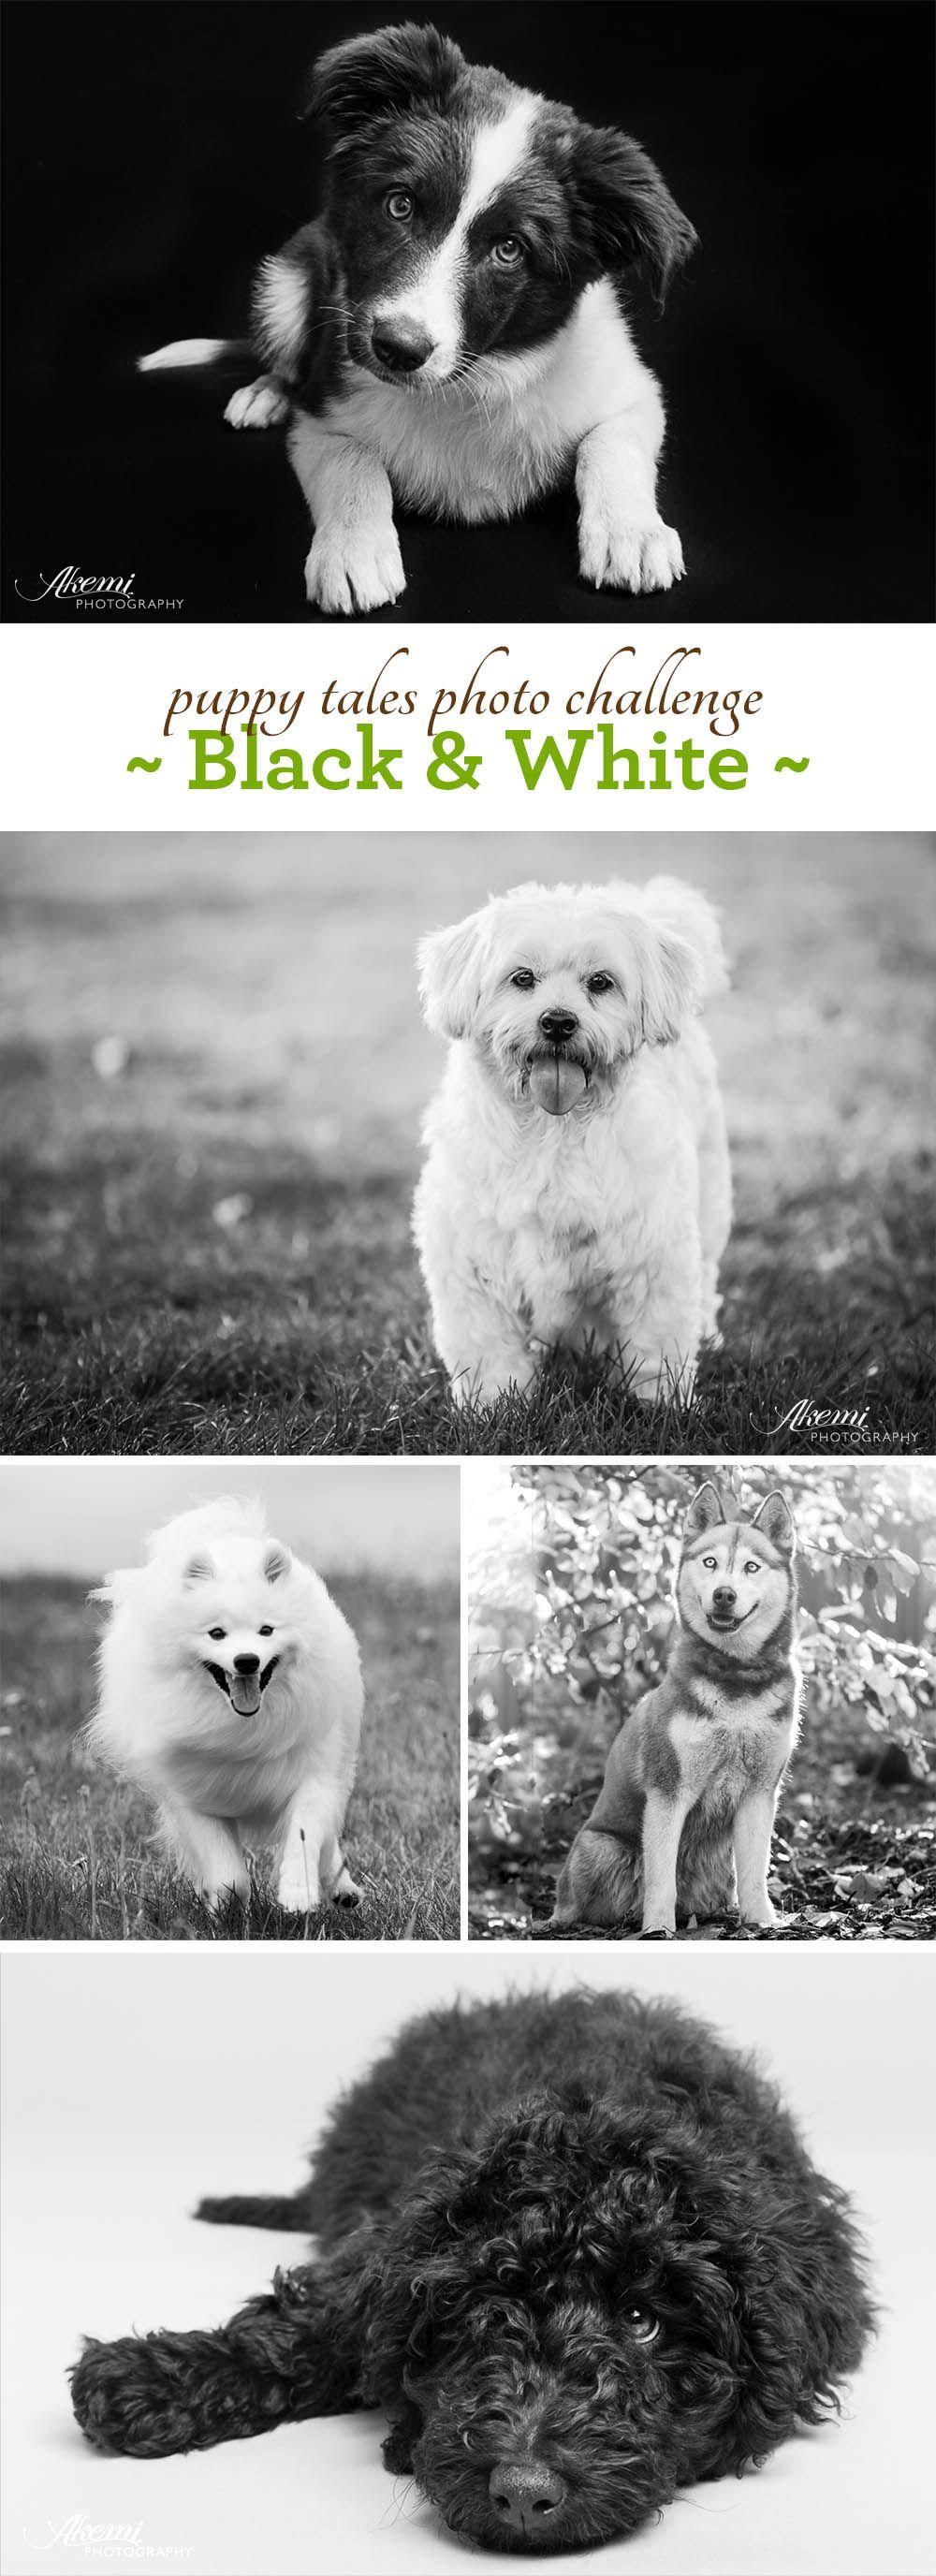 Dog photo challenge black u white dog